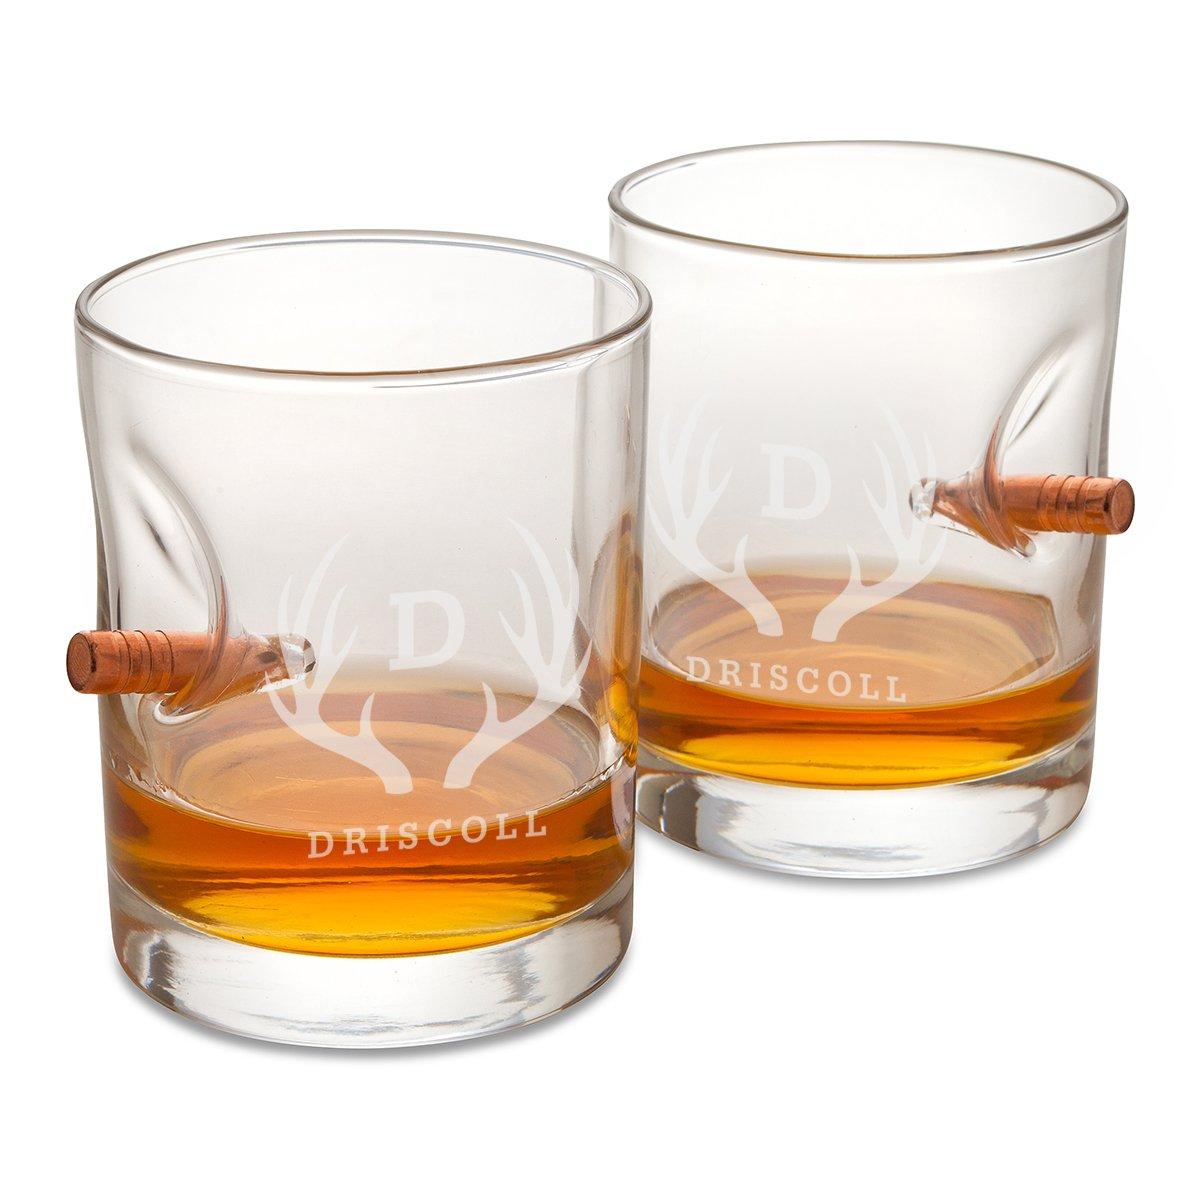 Personalized Bulletproof Whiskey Glass Set - Personalized Whiskey Glasses - Antlers